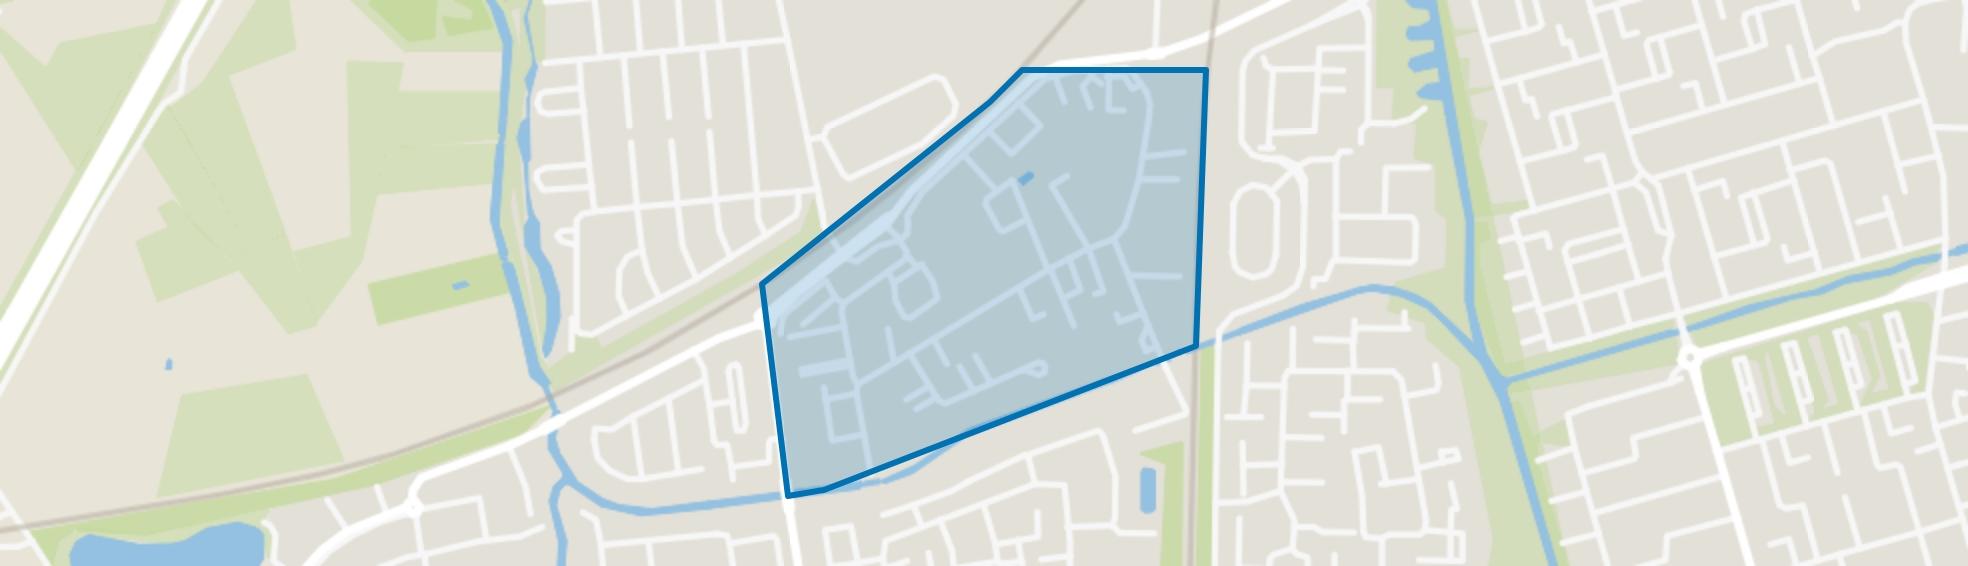 Vijfhuizenberg, Roosendaal map